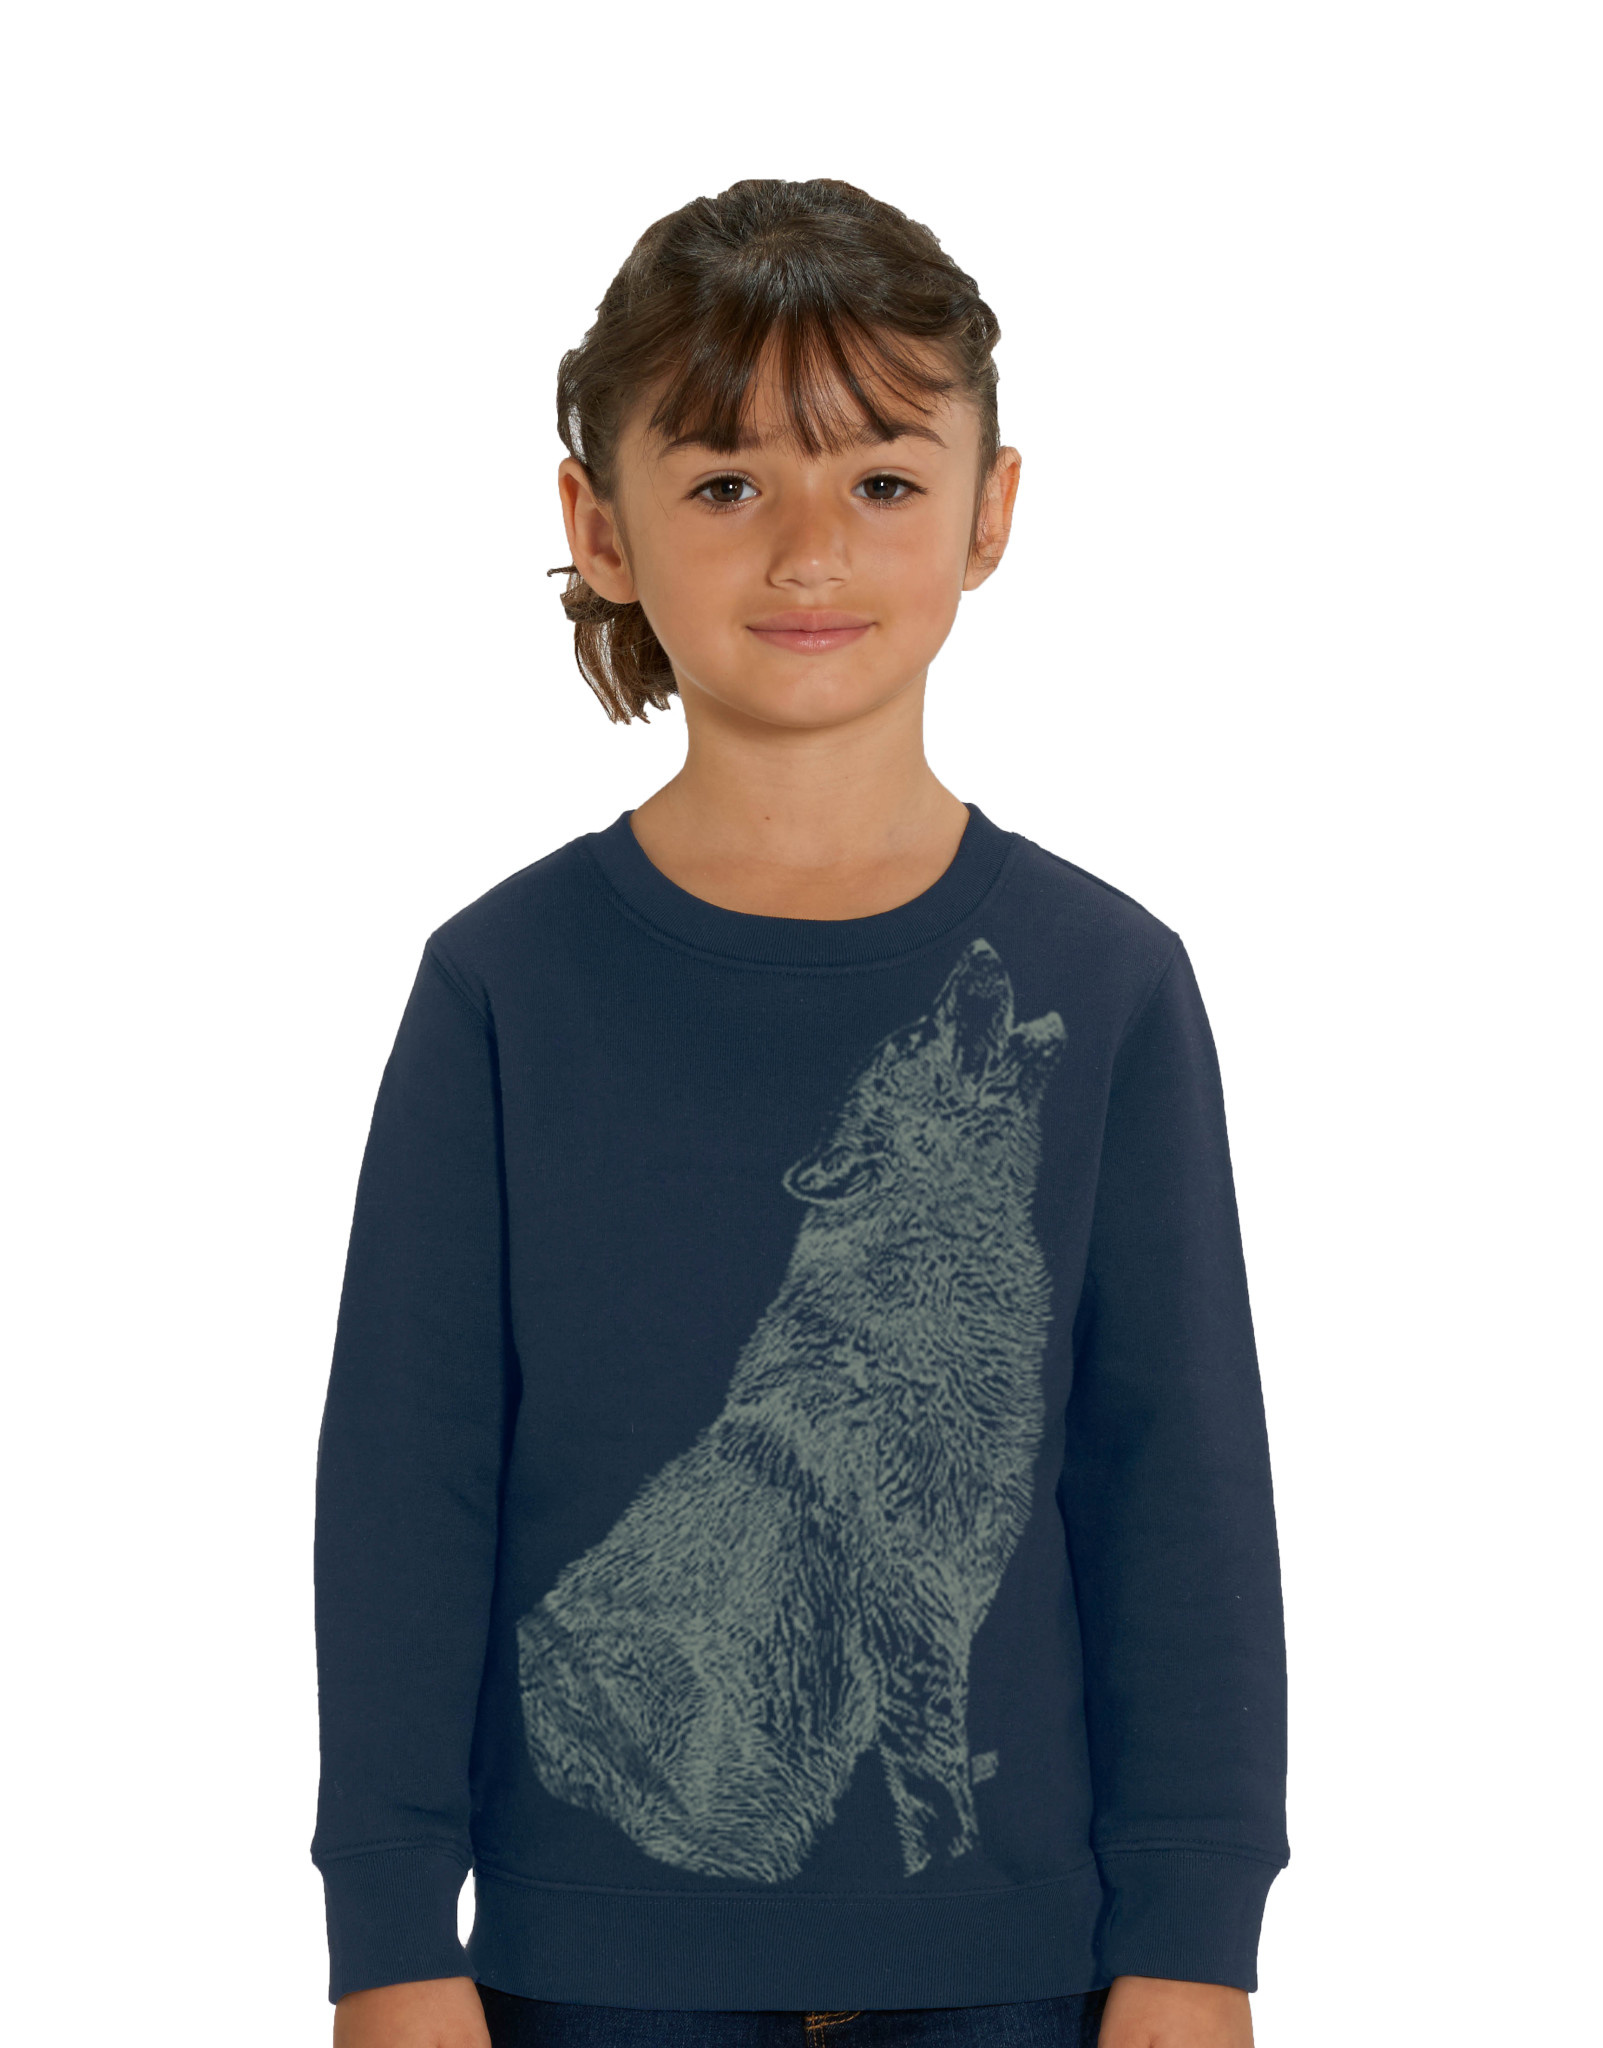 Huilende Wolf Sweater - Glow in the Dark